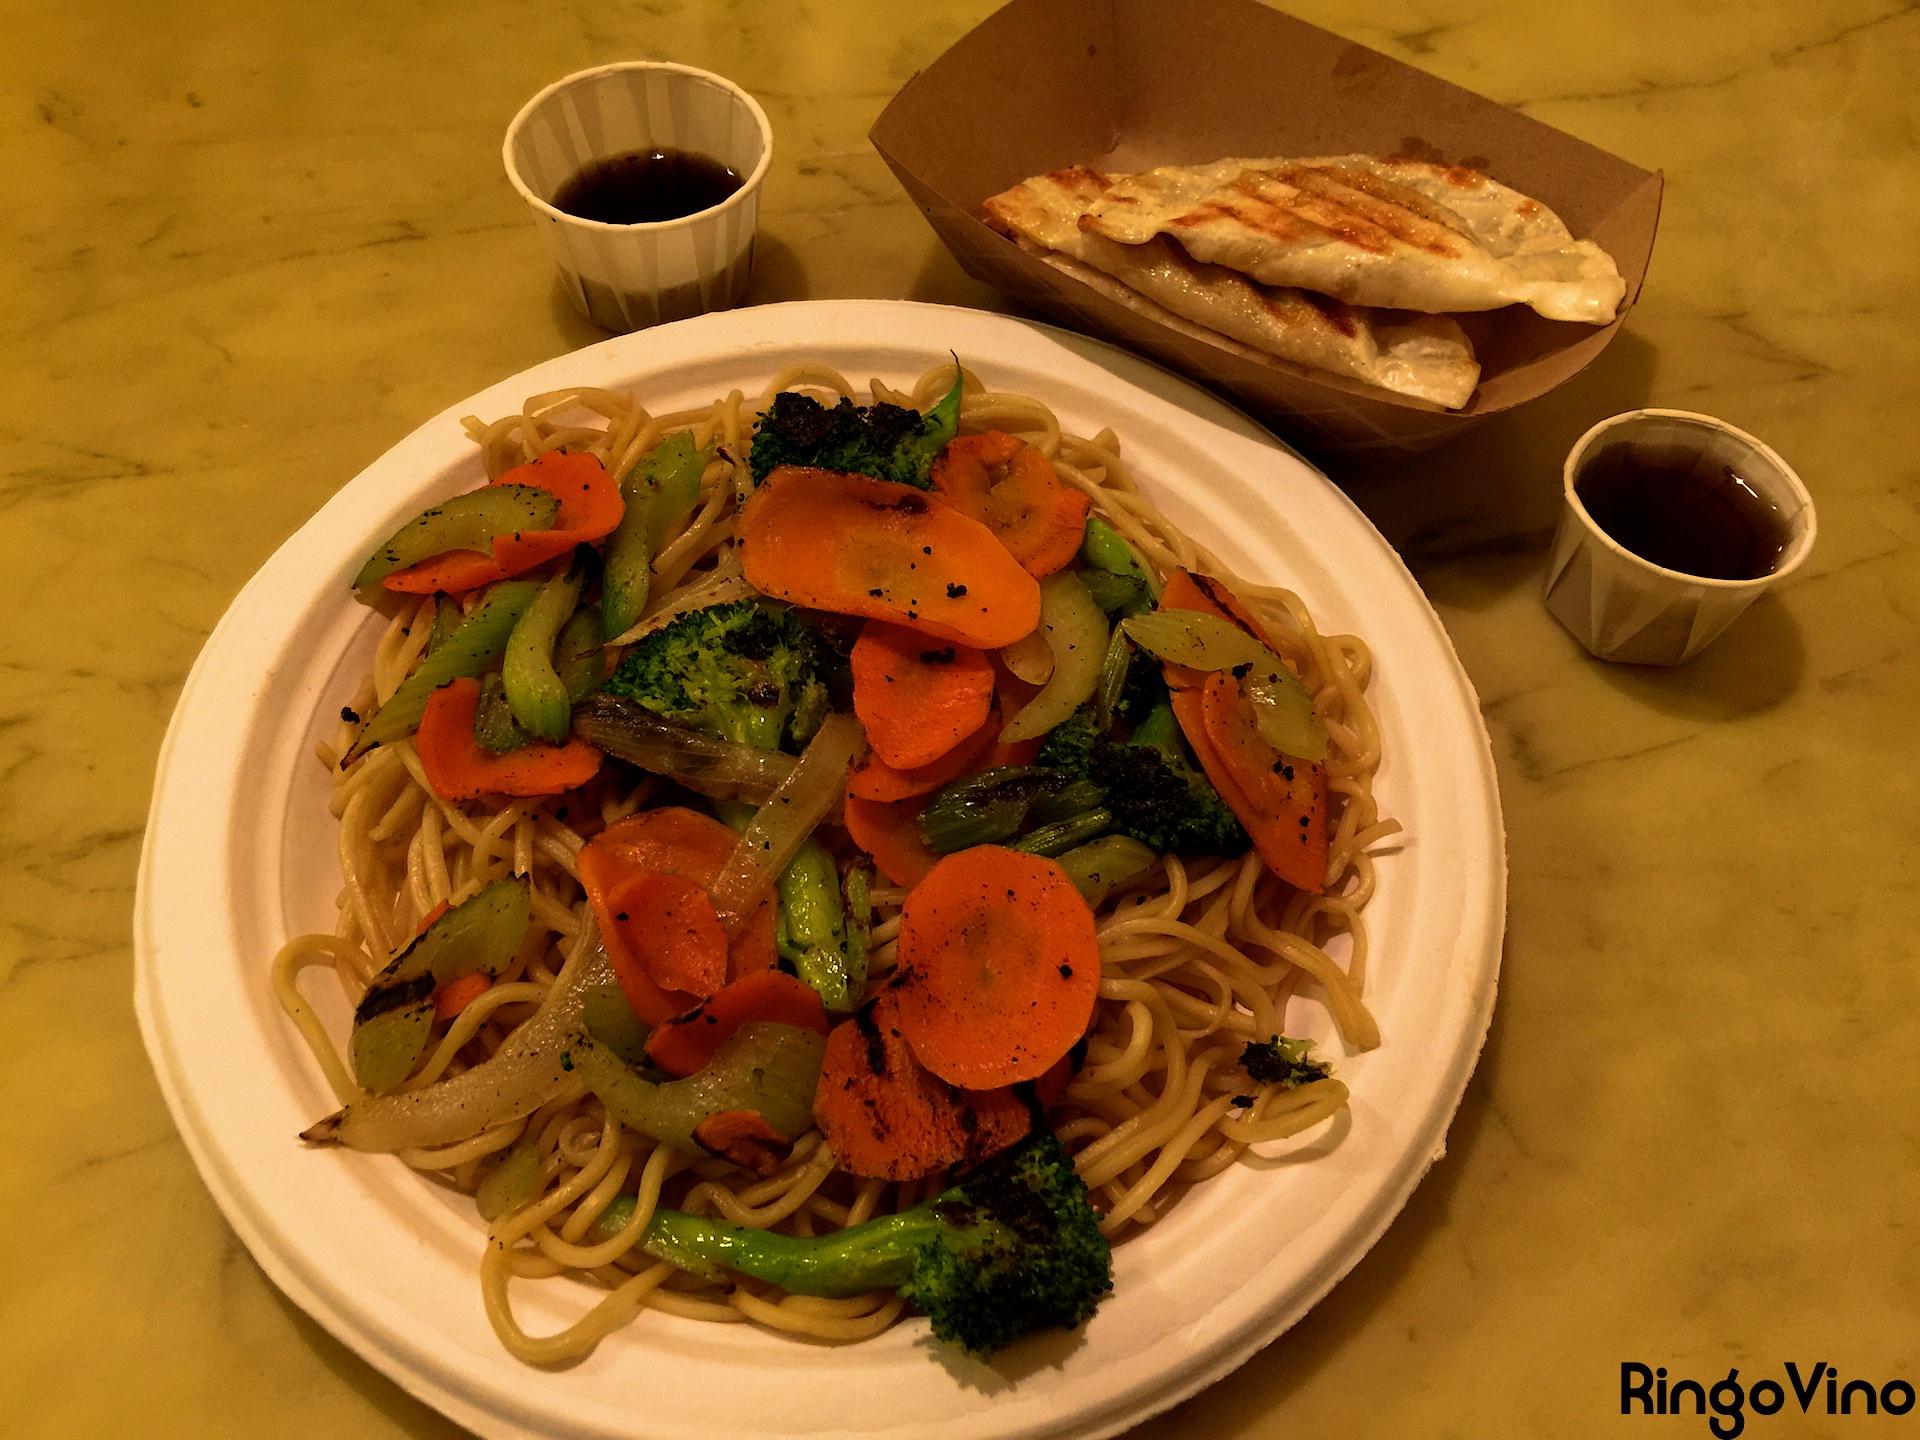 Japanese-style Udon noodles